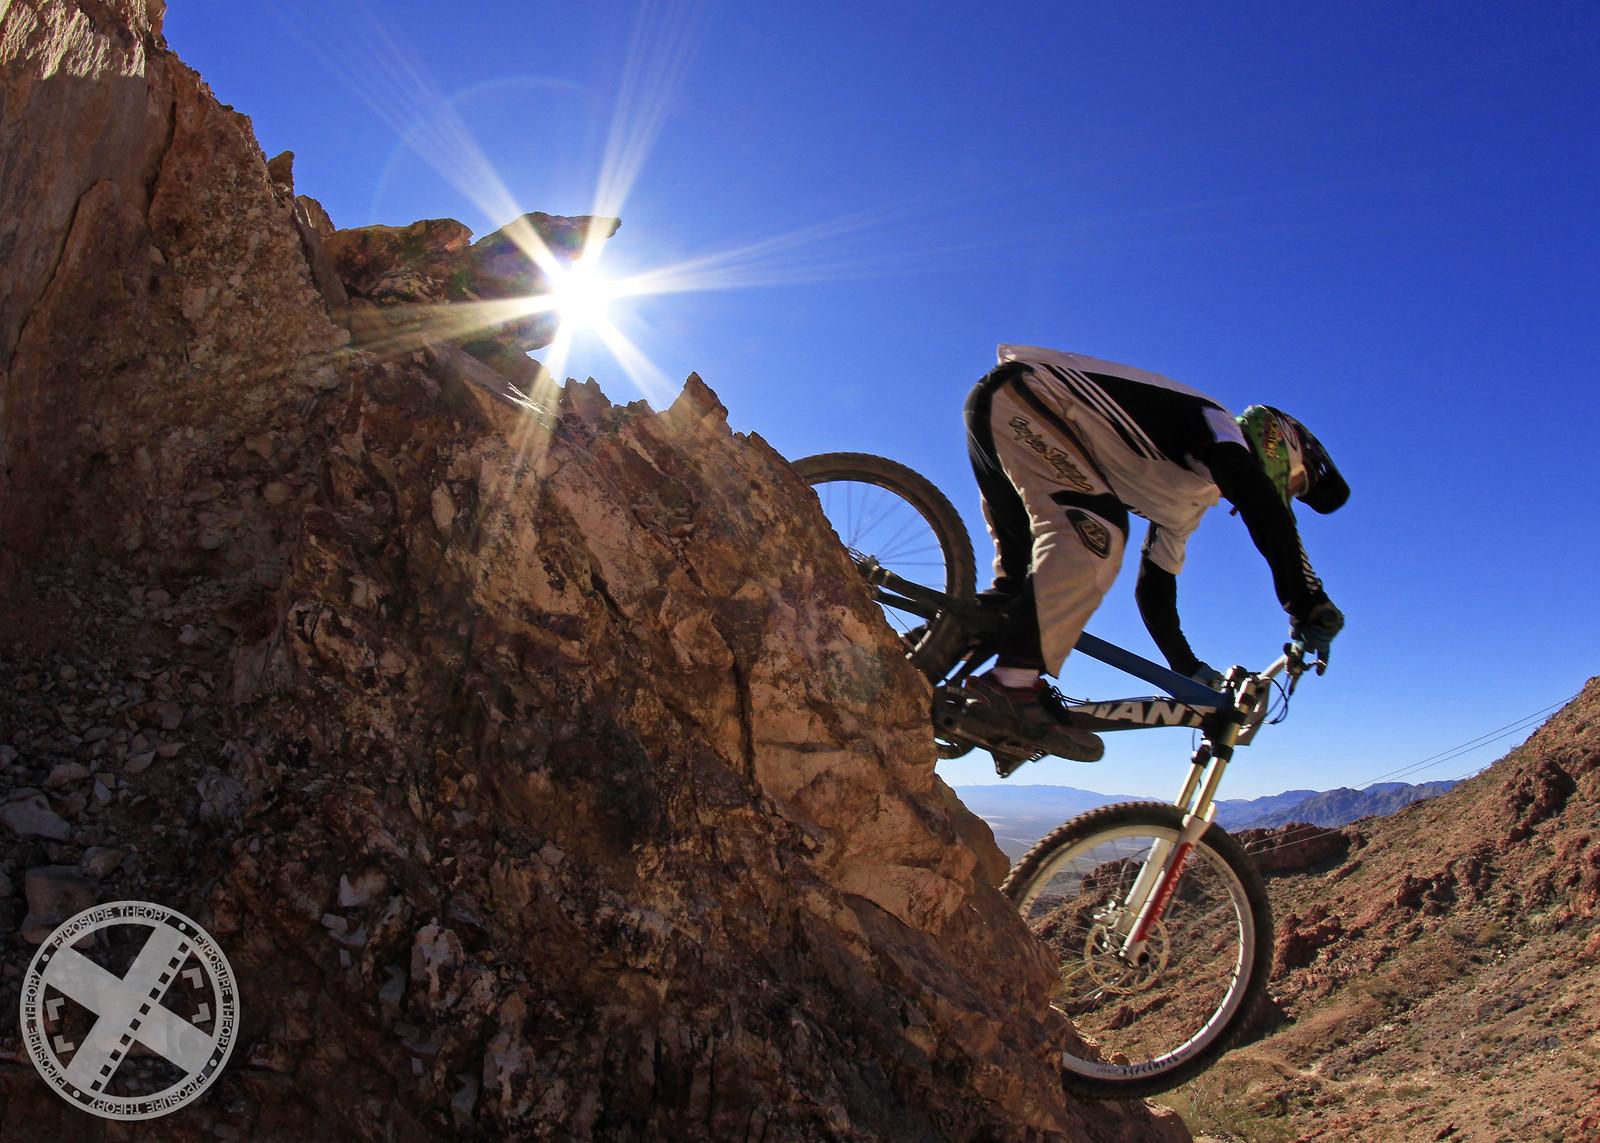 2013 Nevada State DH Race @ Bootleg Canyon. - projekt roam - Mountain Biking Pictures - Vital MTB